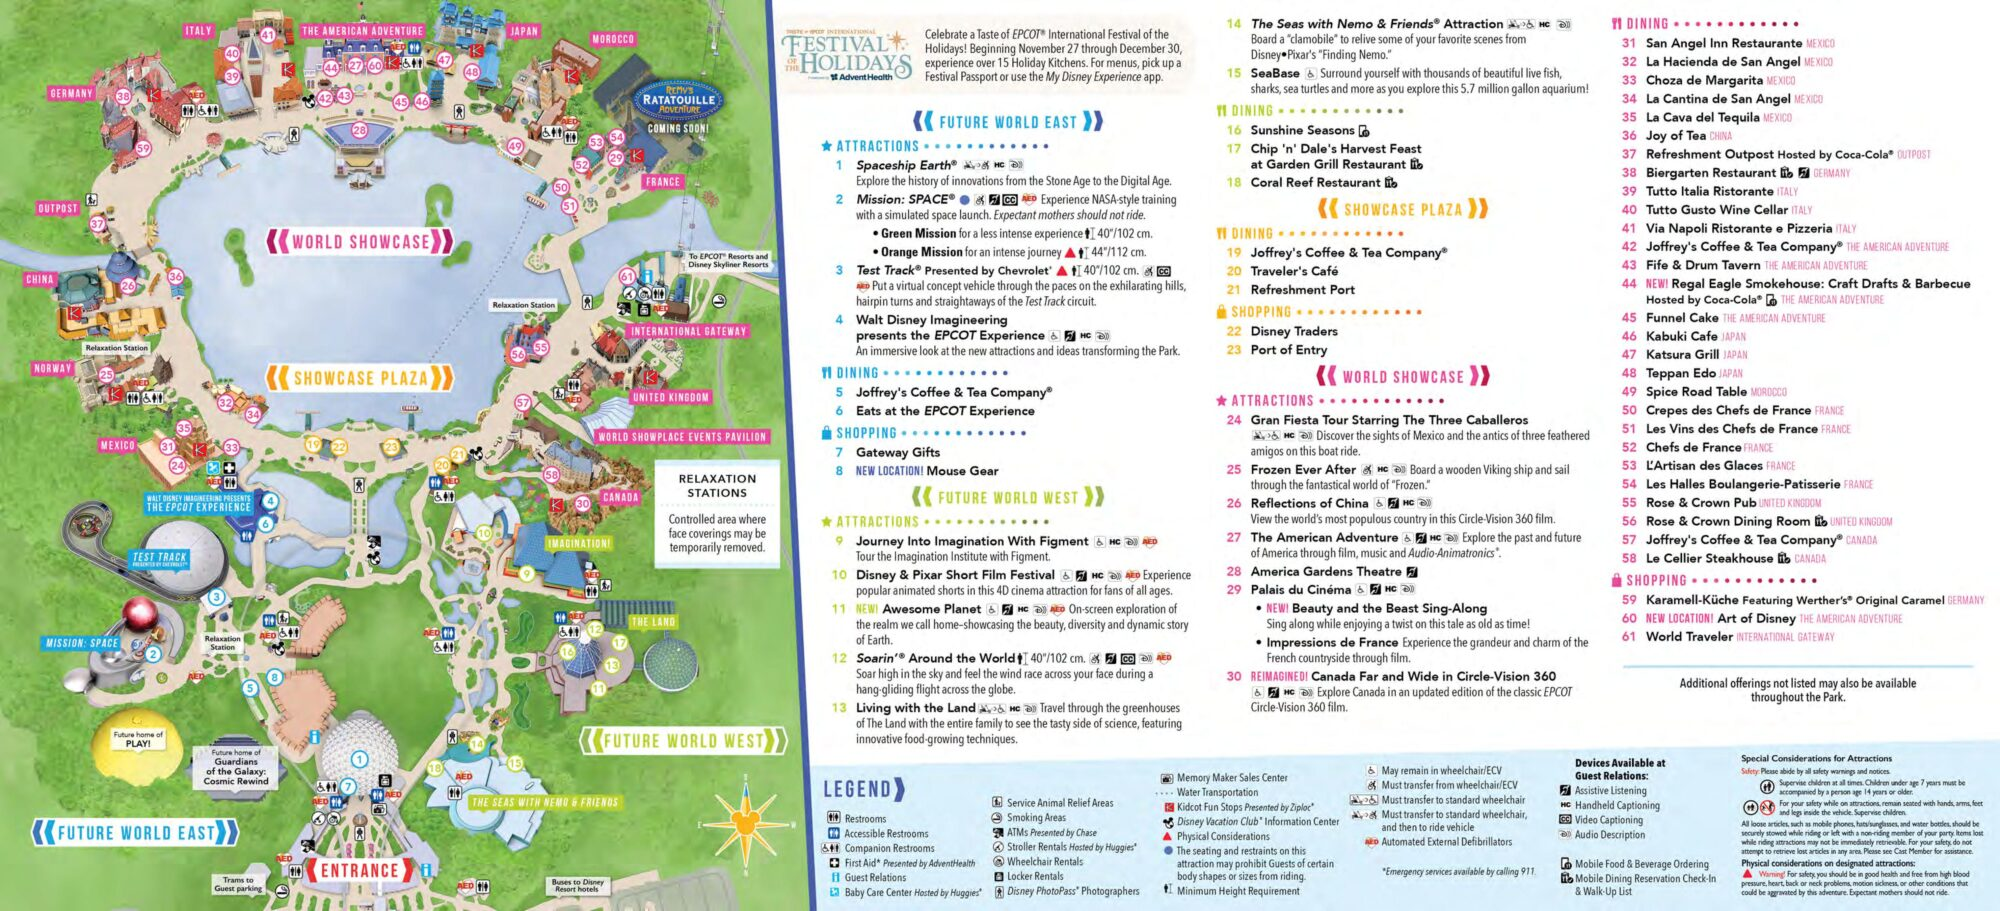 New 2020 Walt Disney World EPCOT Holidays Guidemap Mask 112320 Guide Map